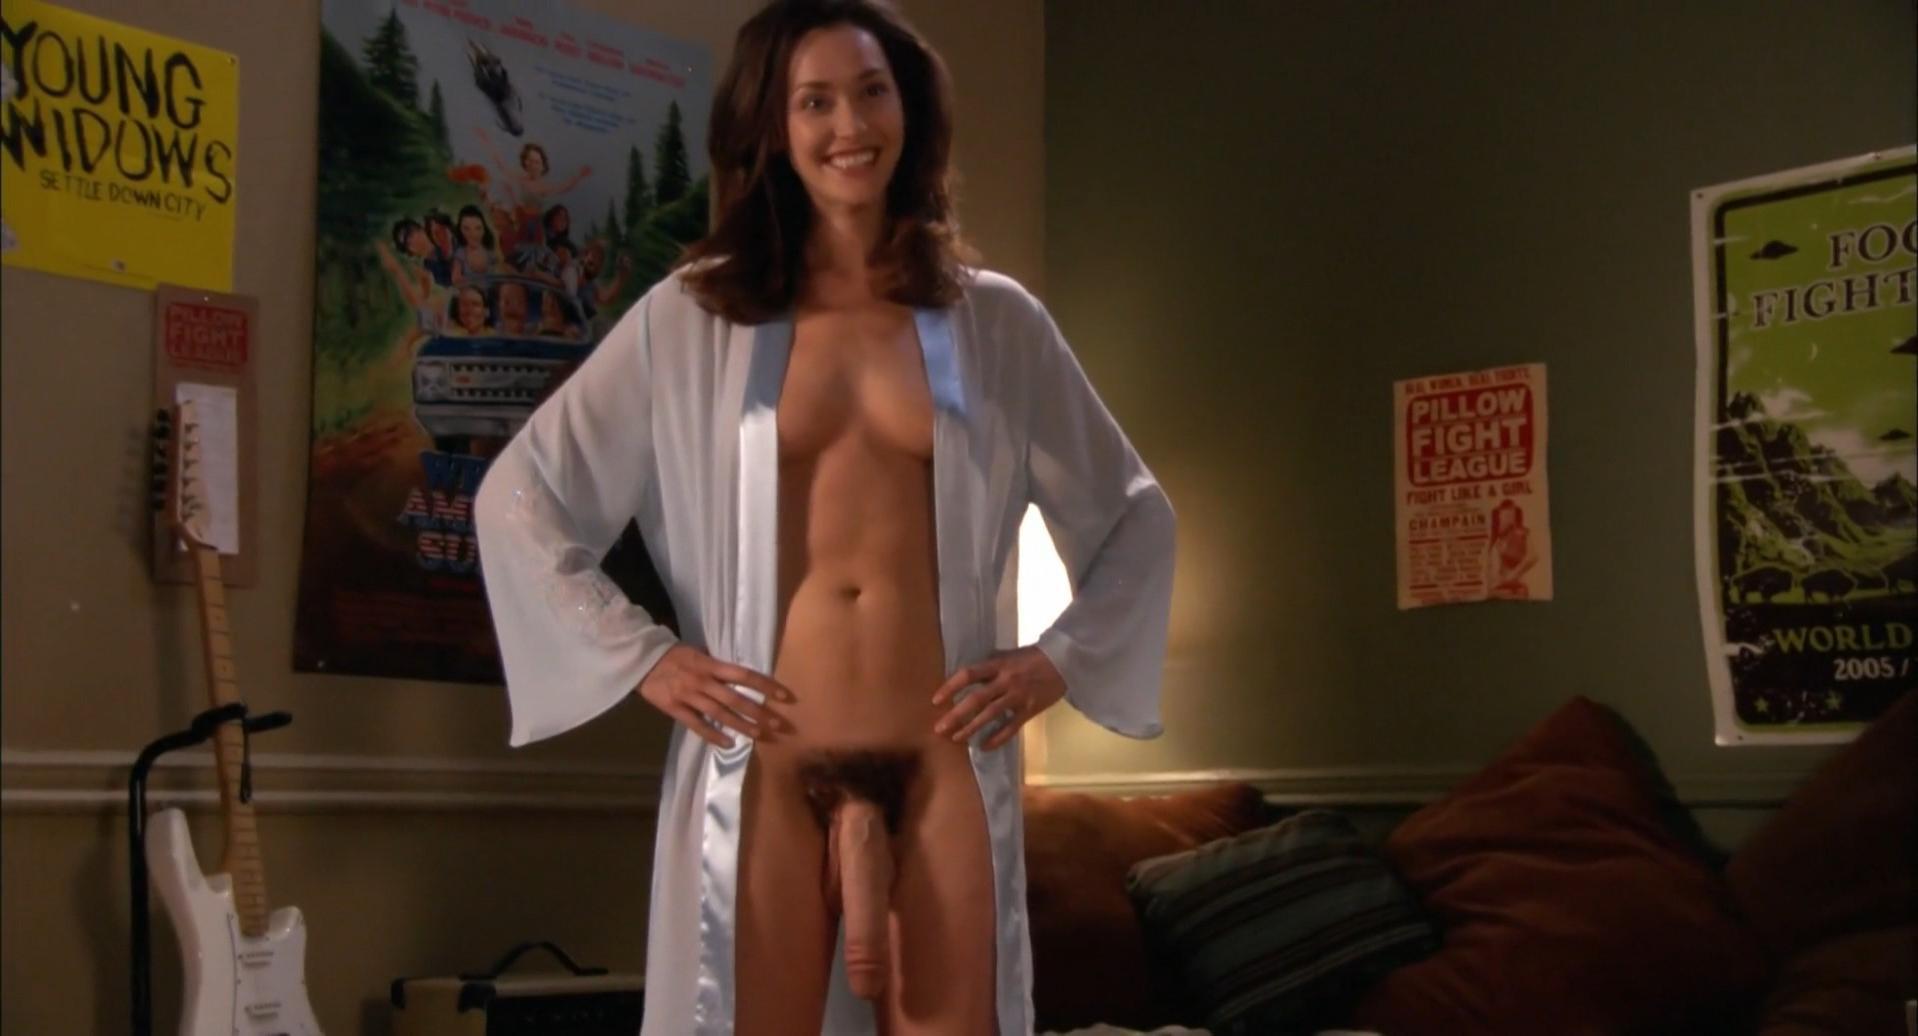 American Pie 3 Nude Scenes american pie beta nude - adult images.